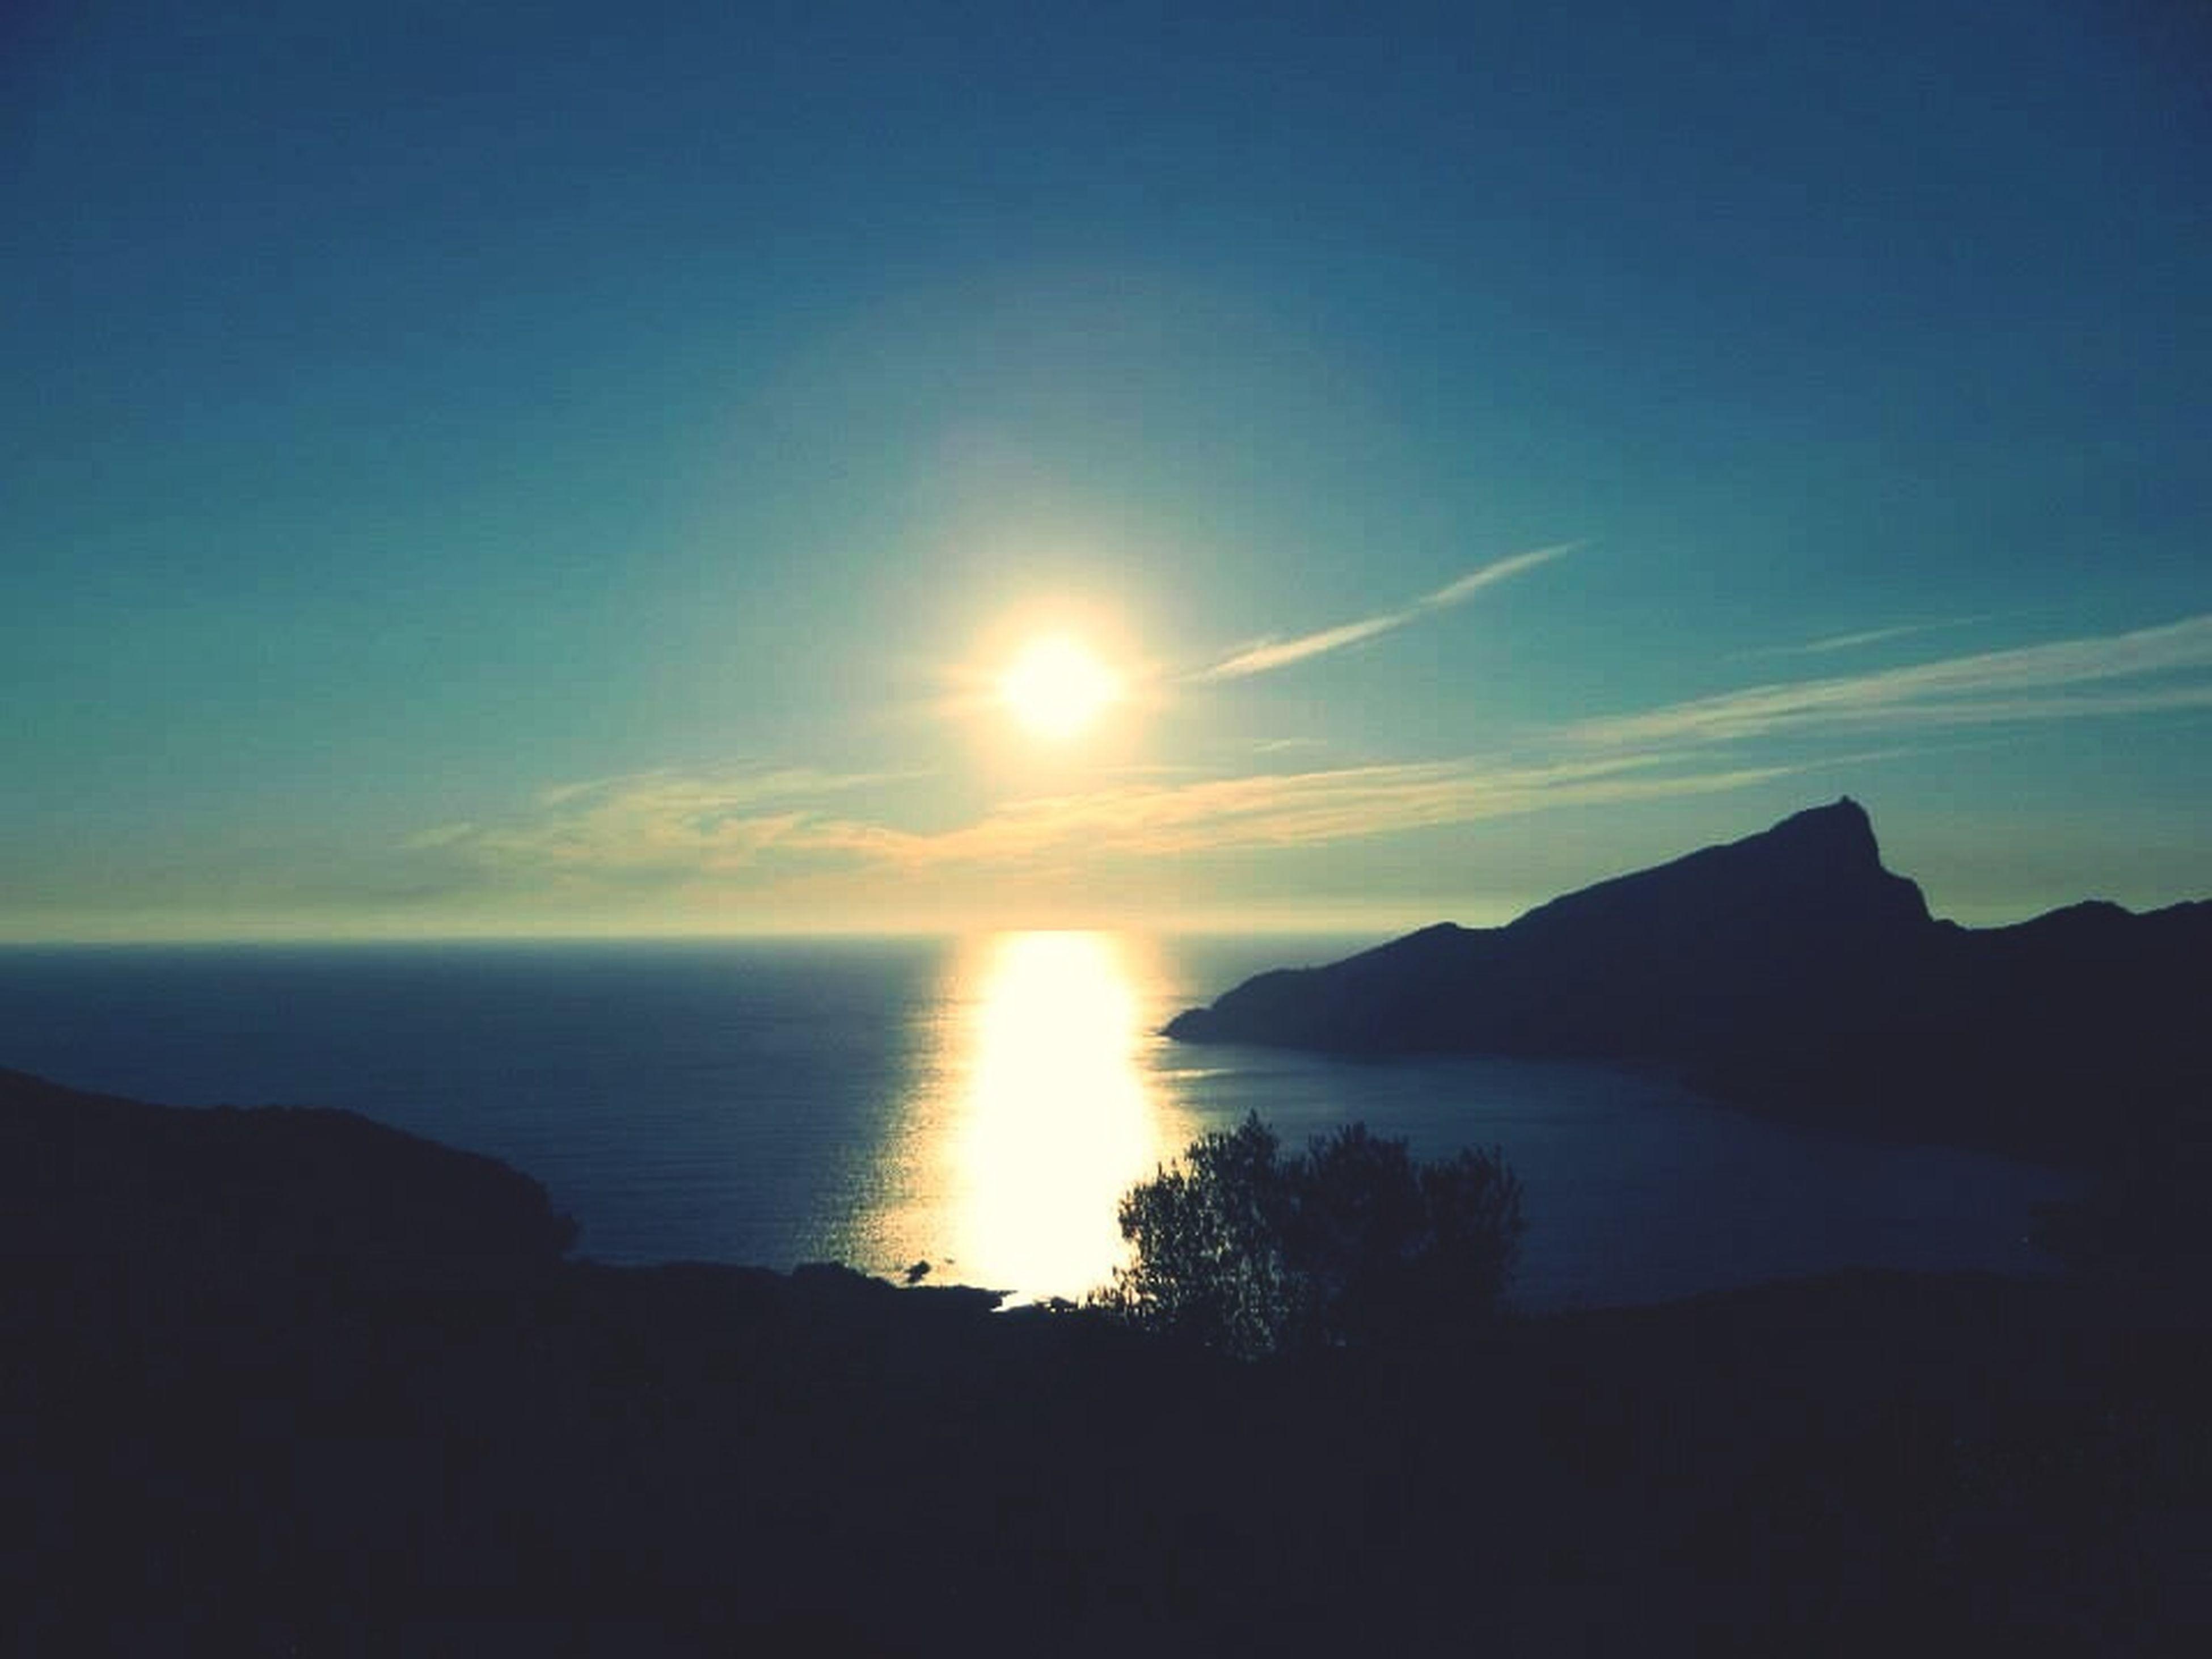 tranquil scene, scenics, sea, water, sun, tranquility, beauty in nature, sky, silhouette, horizon over water, sunset, idyllic, nature, reflection, mountain, sunlight, sunbeam, blue, calm, outdoors